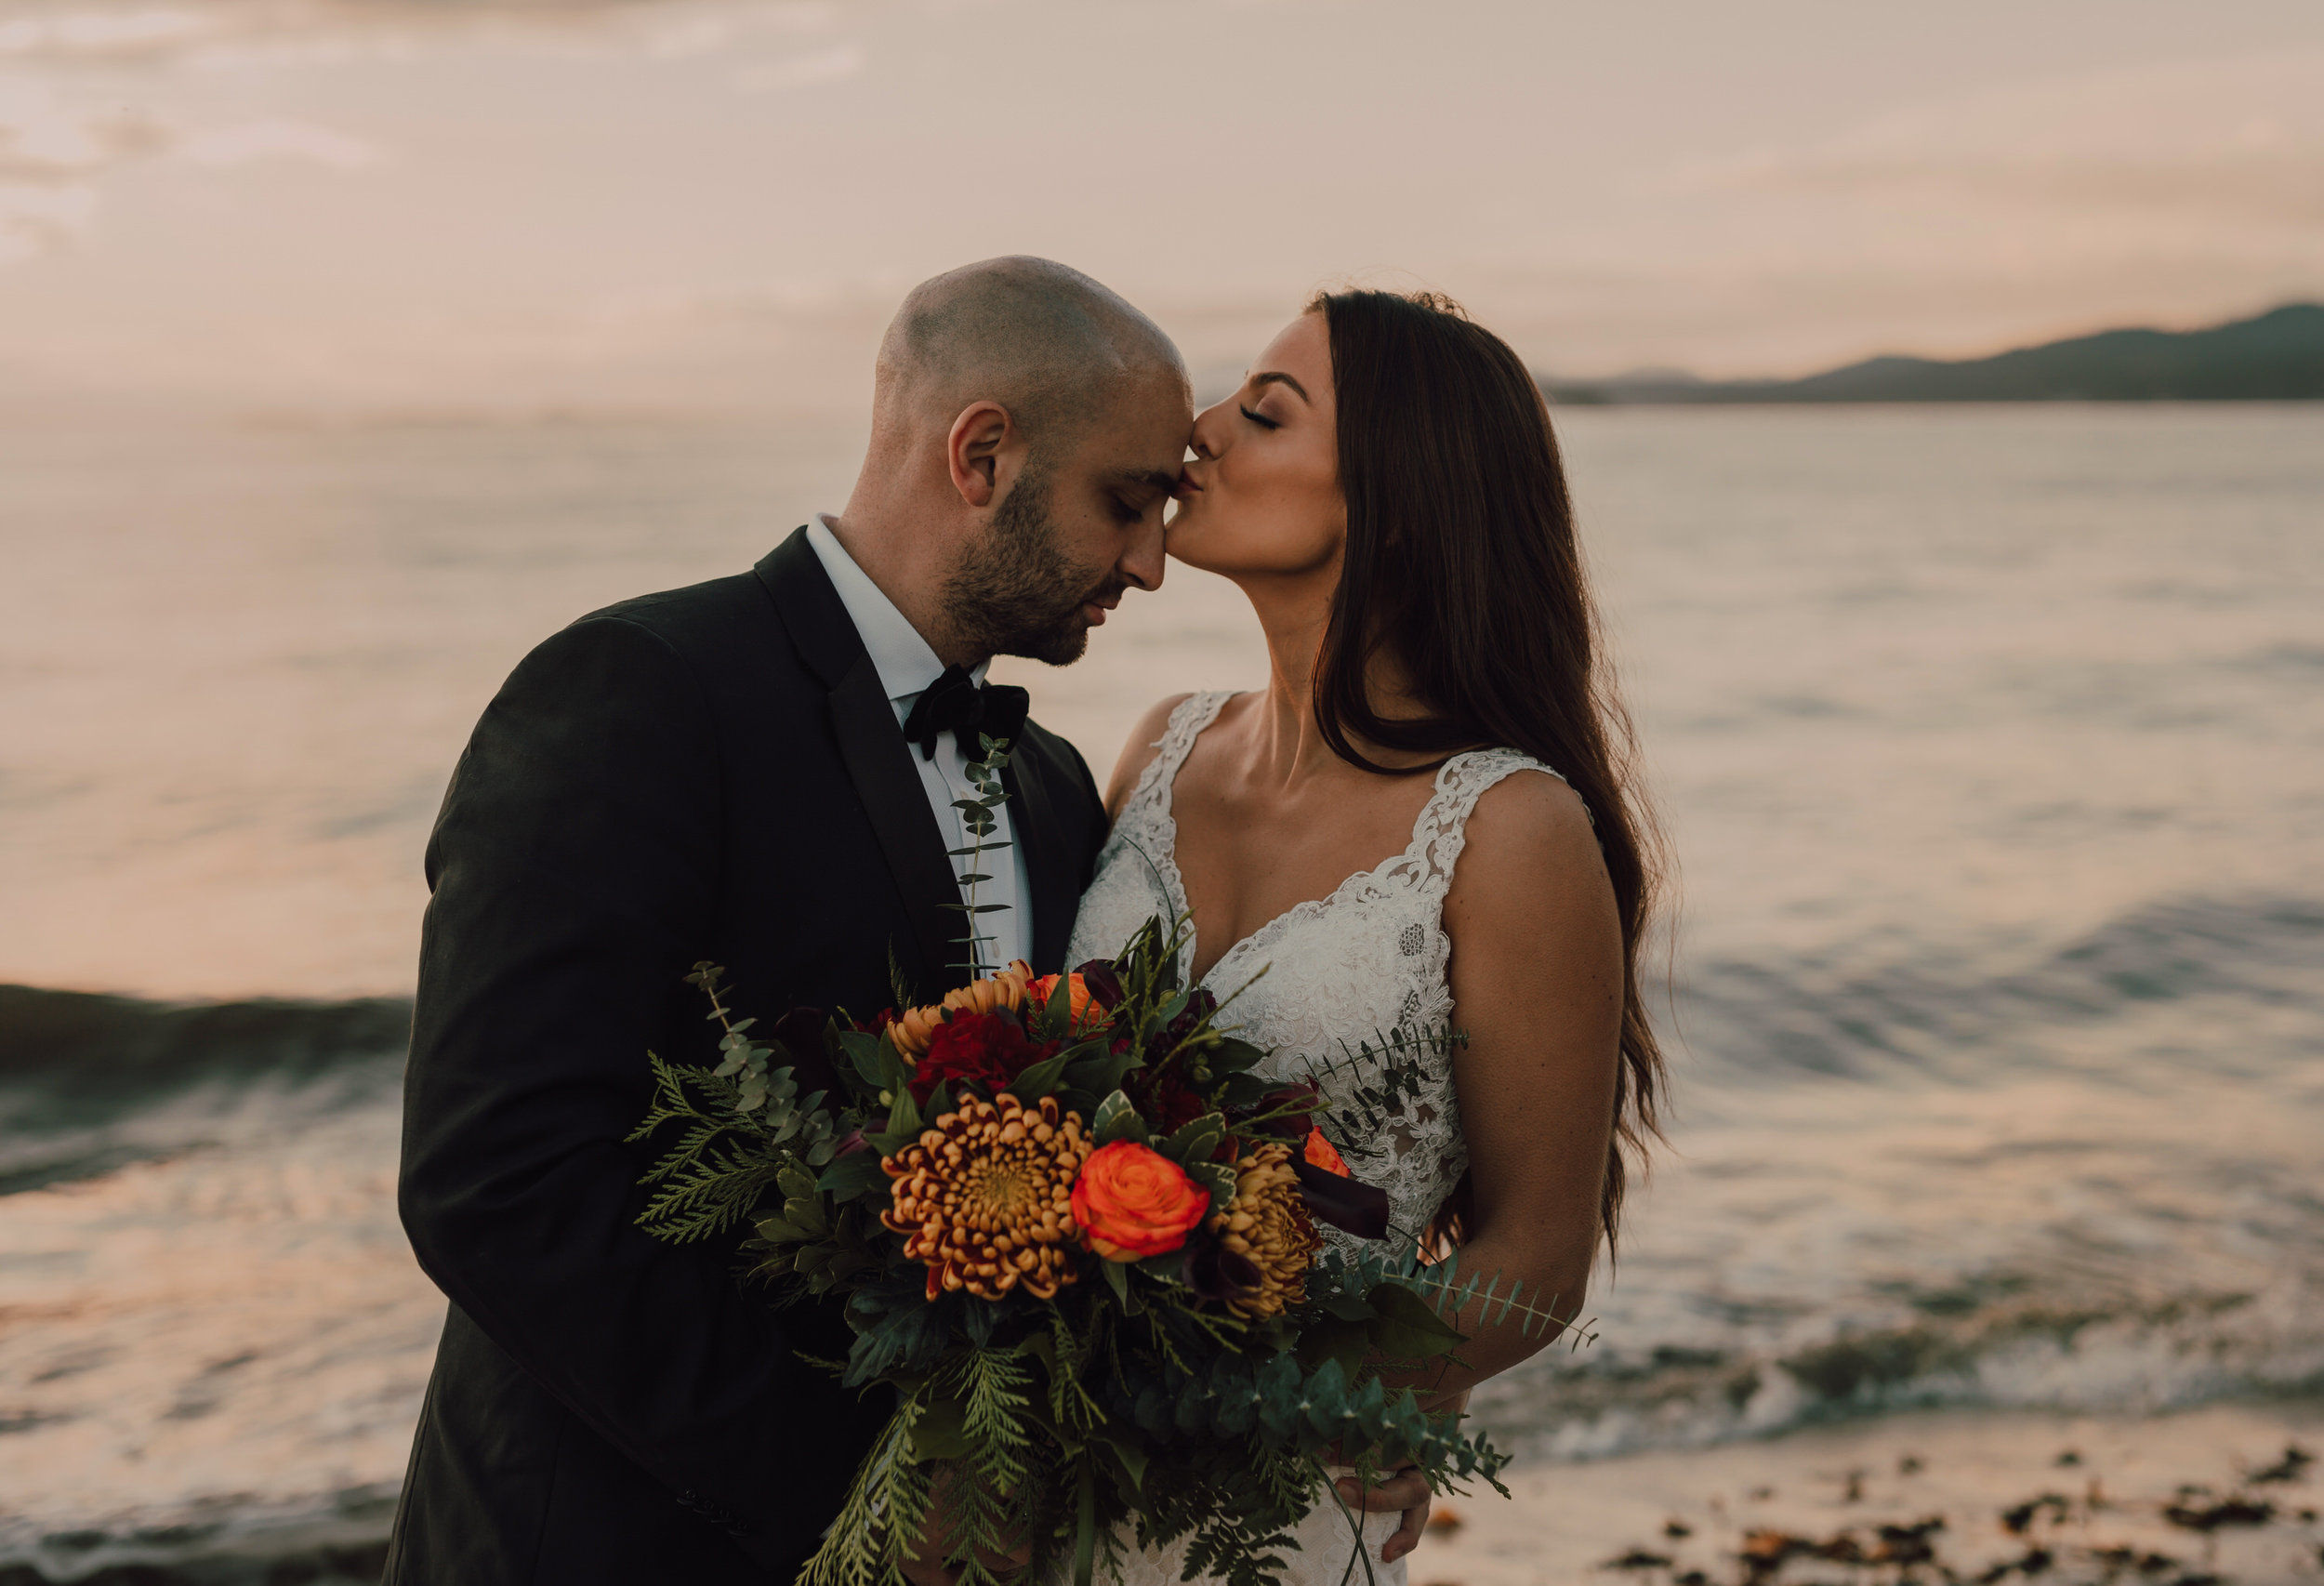 Day After Wedding Photos - Sunshine Coast Wedding Photos - Sunset Wedding Photos - Vancouver Wedding Photographer & Videographer - Sunshine Coast Wedding Photos - Sunshine Coast Wedding Photographer - Jennifer Picard Photography - 1A5A9293.jpg